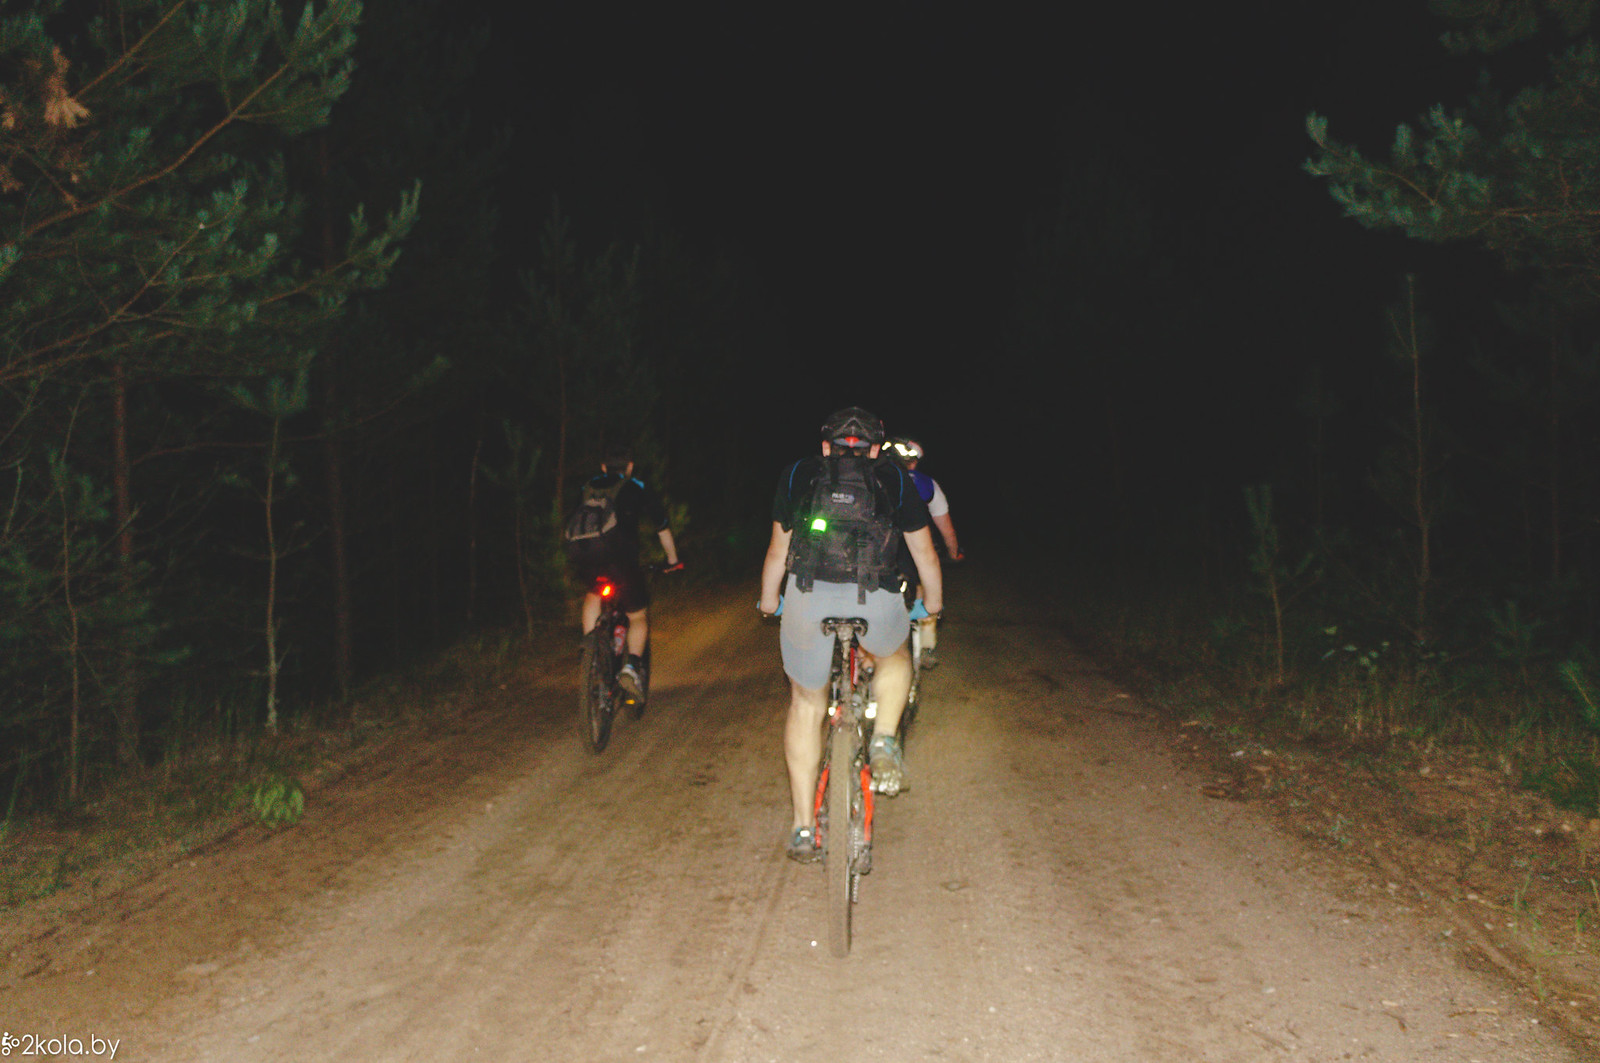 35589811303 c78a92973d h - Ночная велопокатушка 2017 (Тимковичи - Люща)